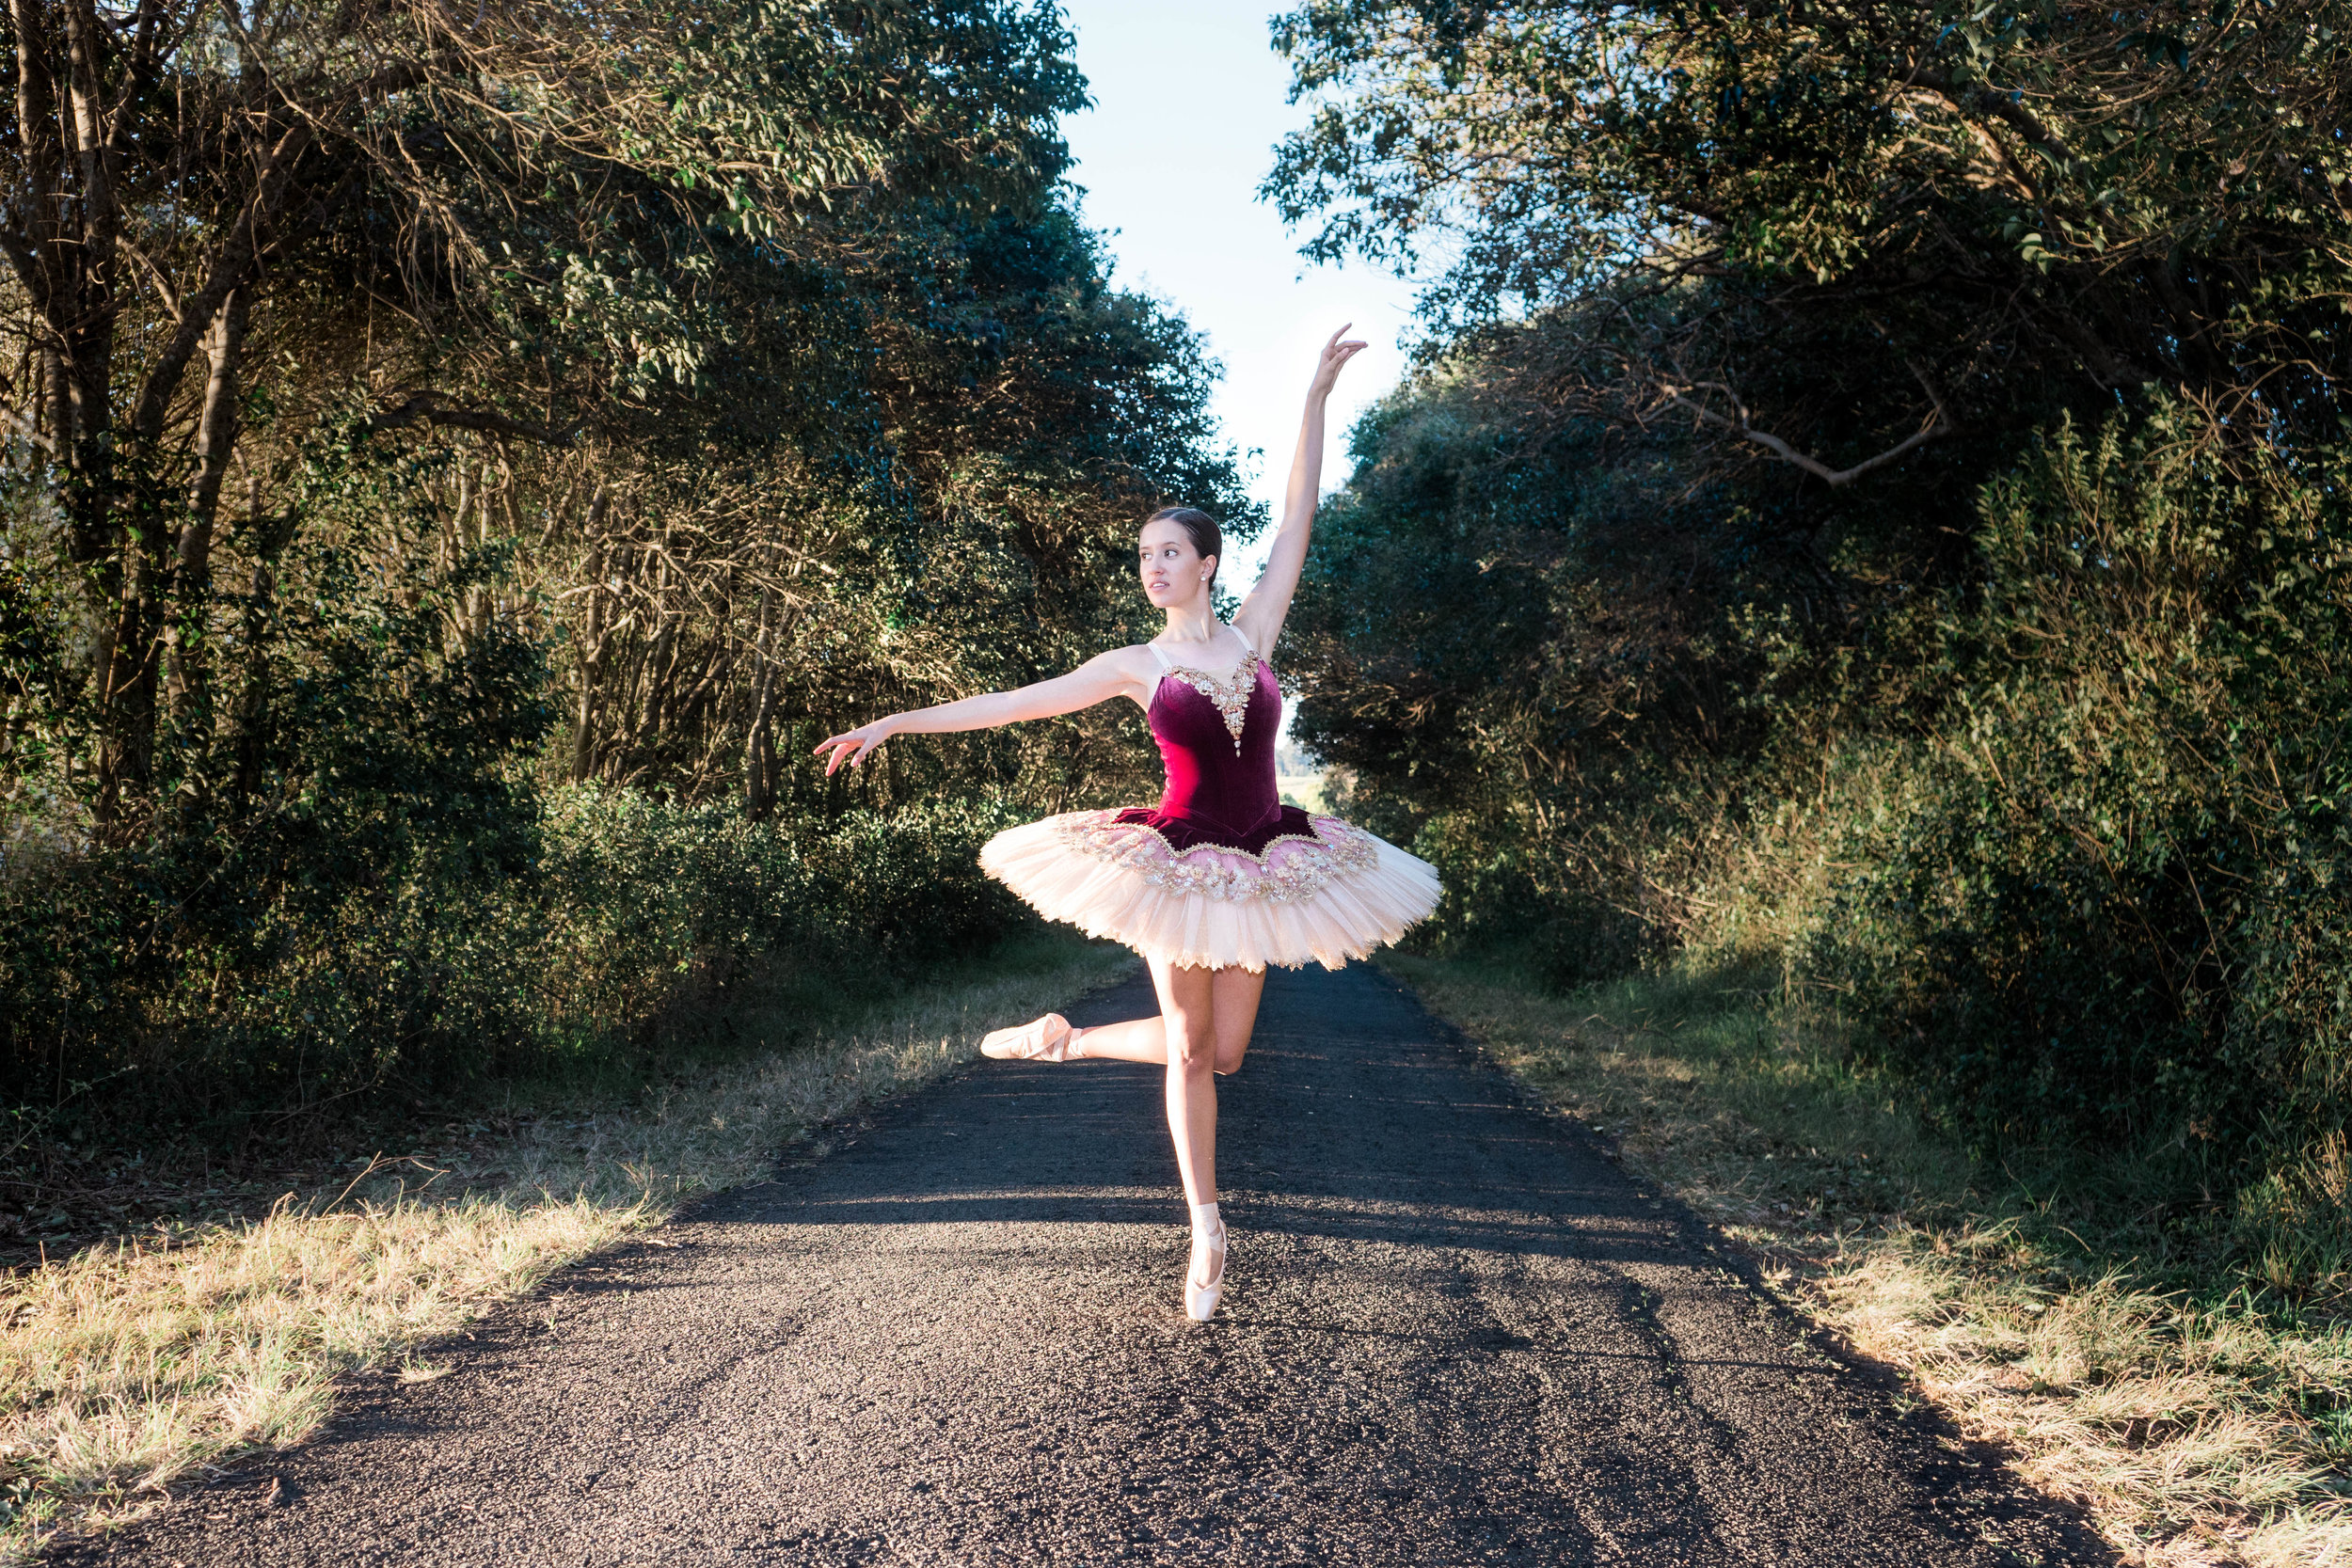 Hinterland-Dance-20.08.17-39.jpg